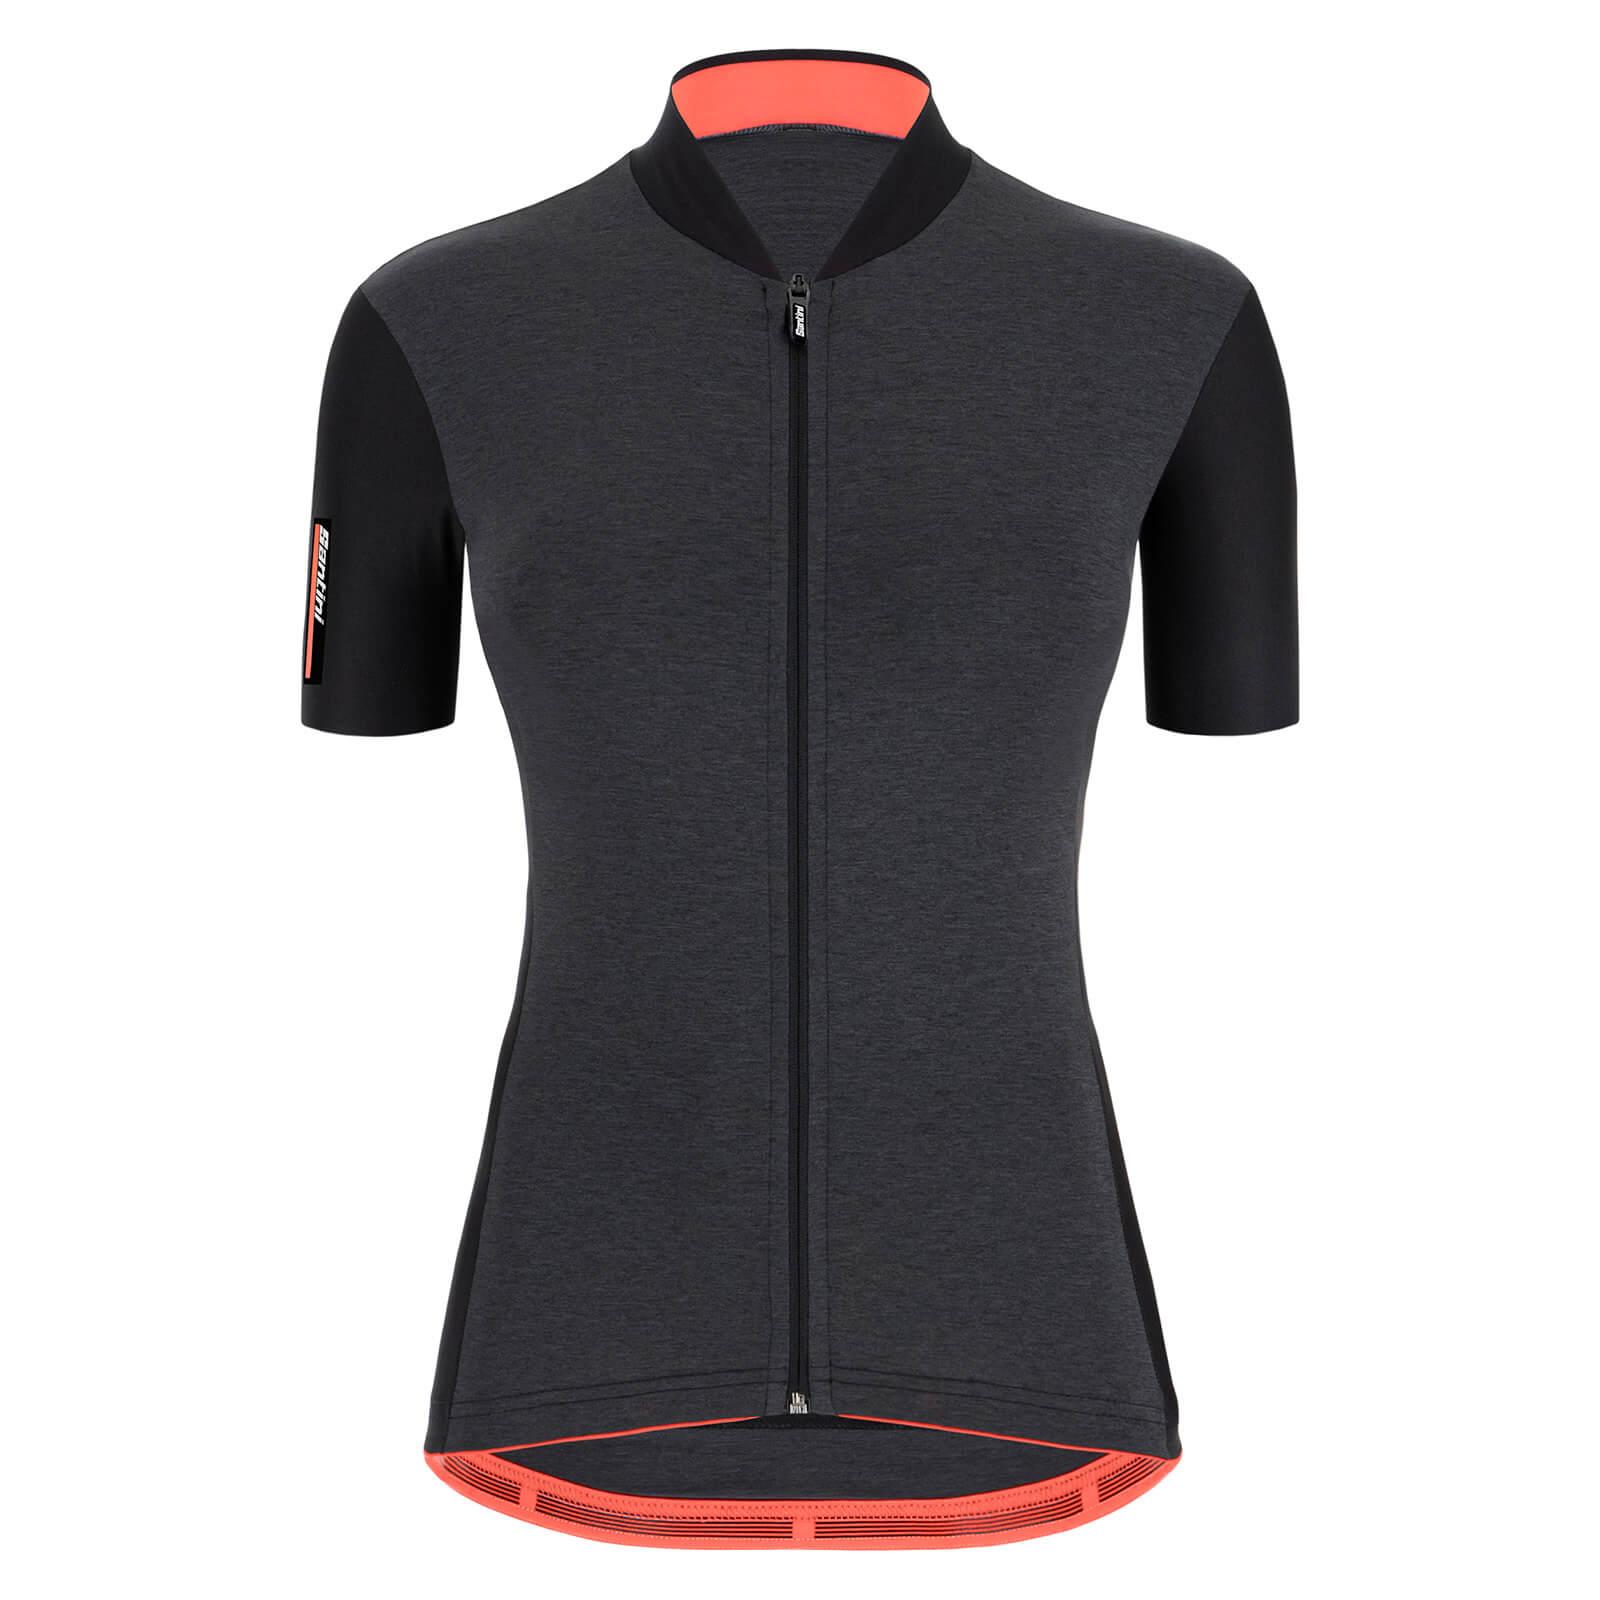 Santini Women's Colore Jersey - M - Black